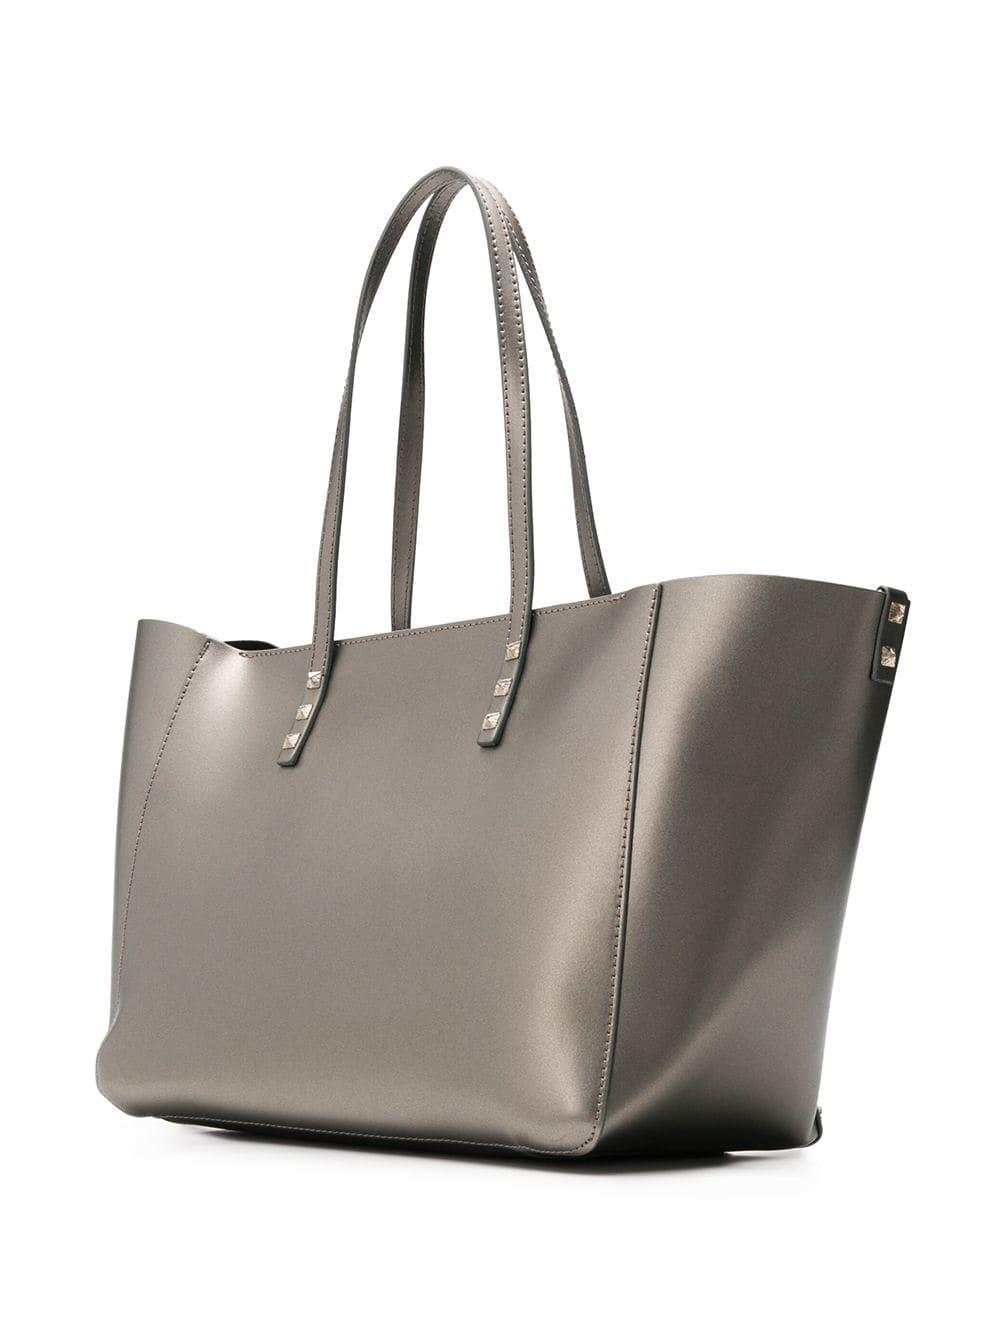 2364f3f8818 Lyst - Marc Ellis Chrissy Studded Tote Bag in Metallic